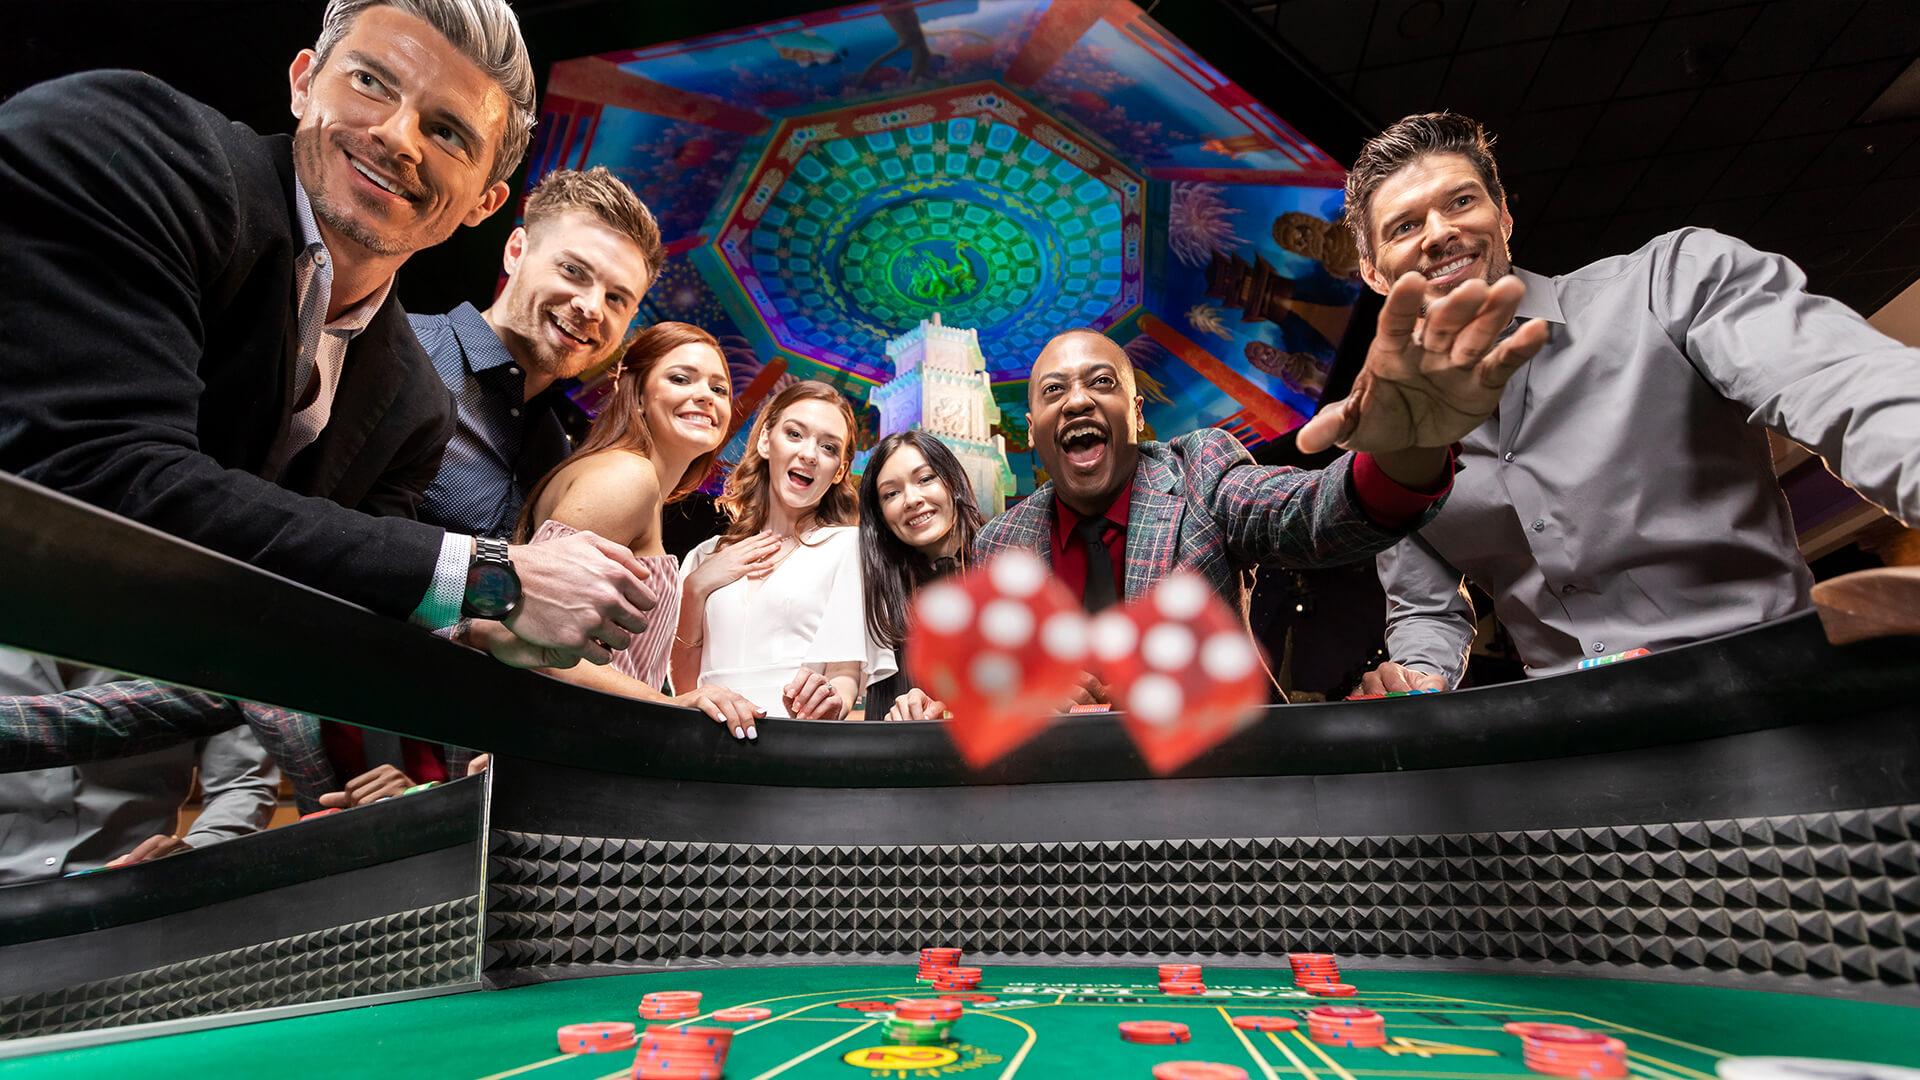 Charter casino seneca niagara casino new york